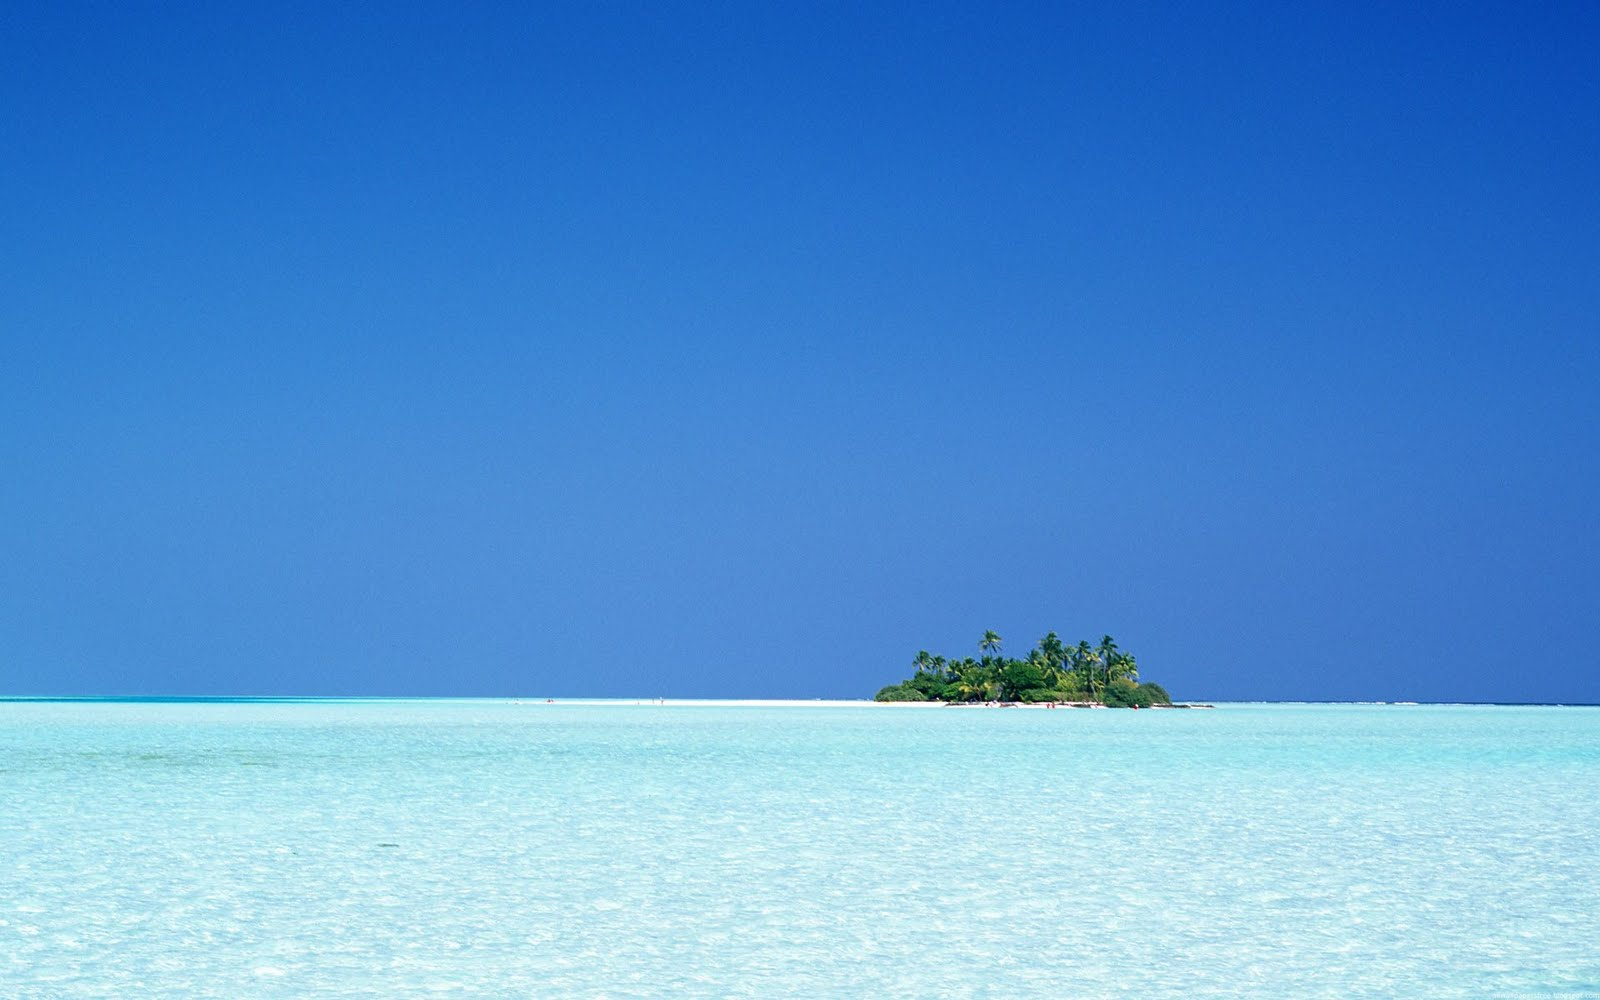 beach pictures wallpaper,blue,body of water,sky,sea,ocean